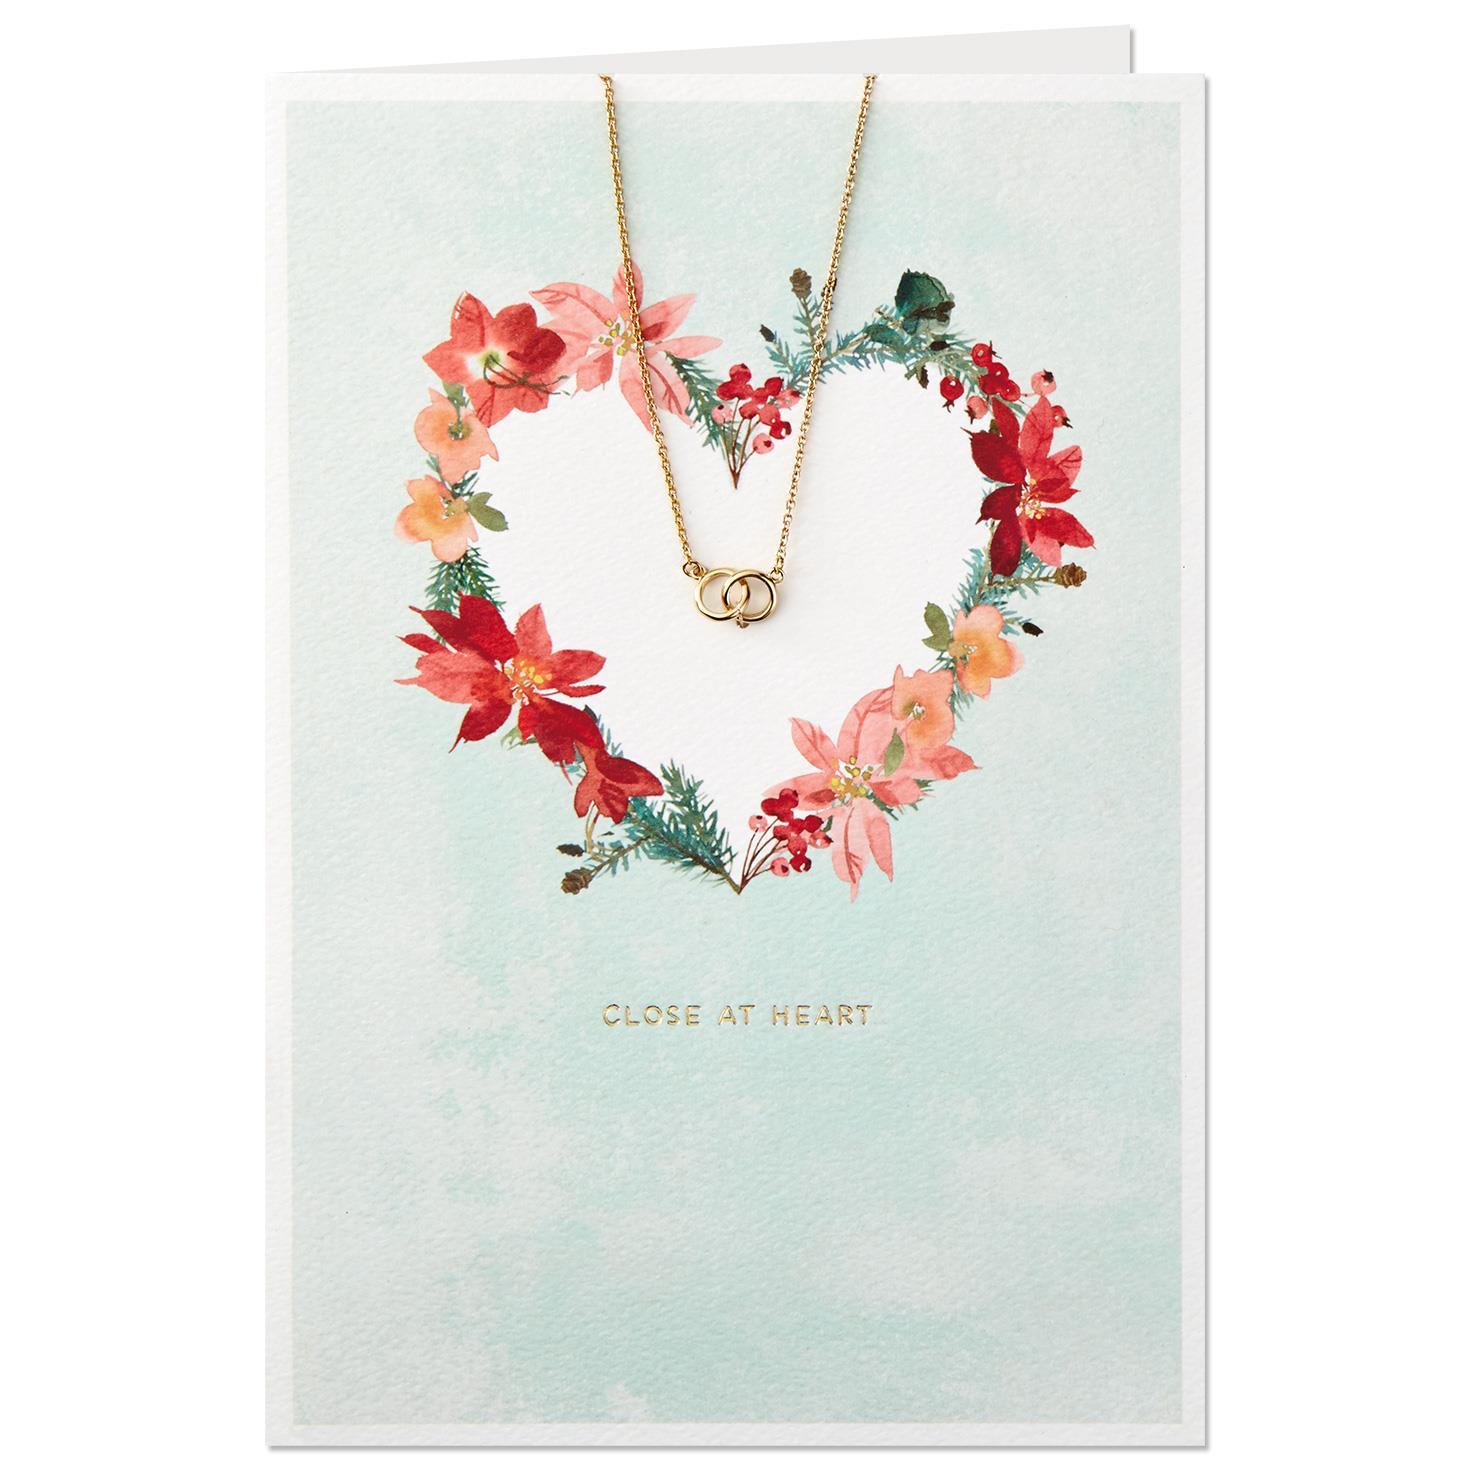 Heart Wreath Christmas Card With Interlocking Circles